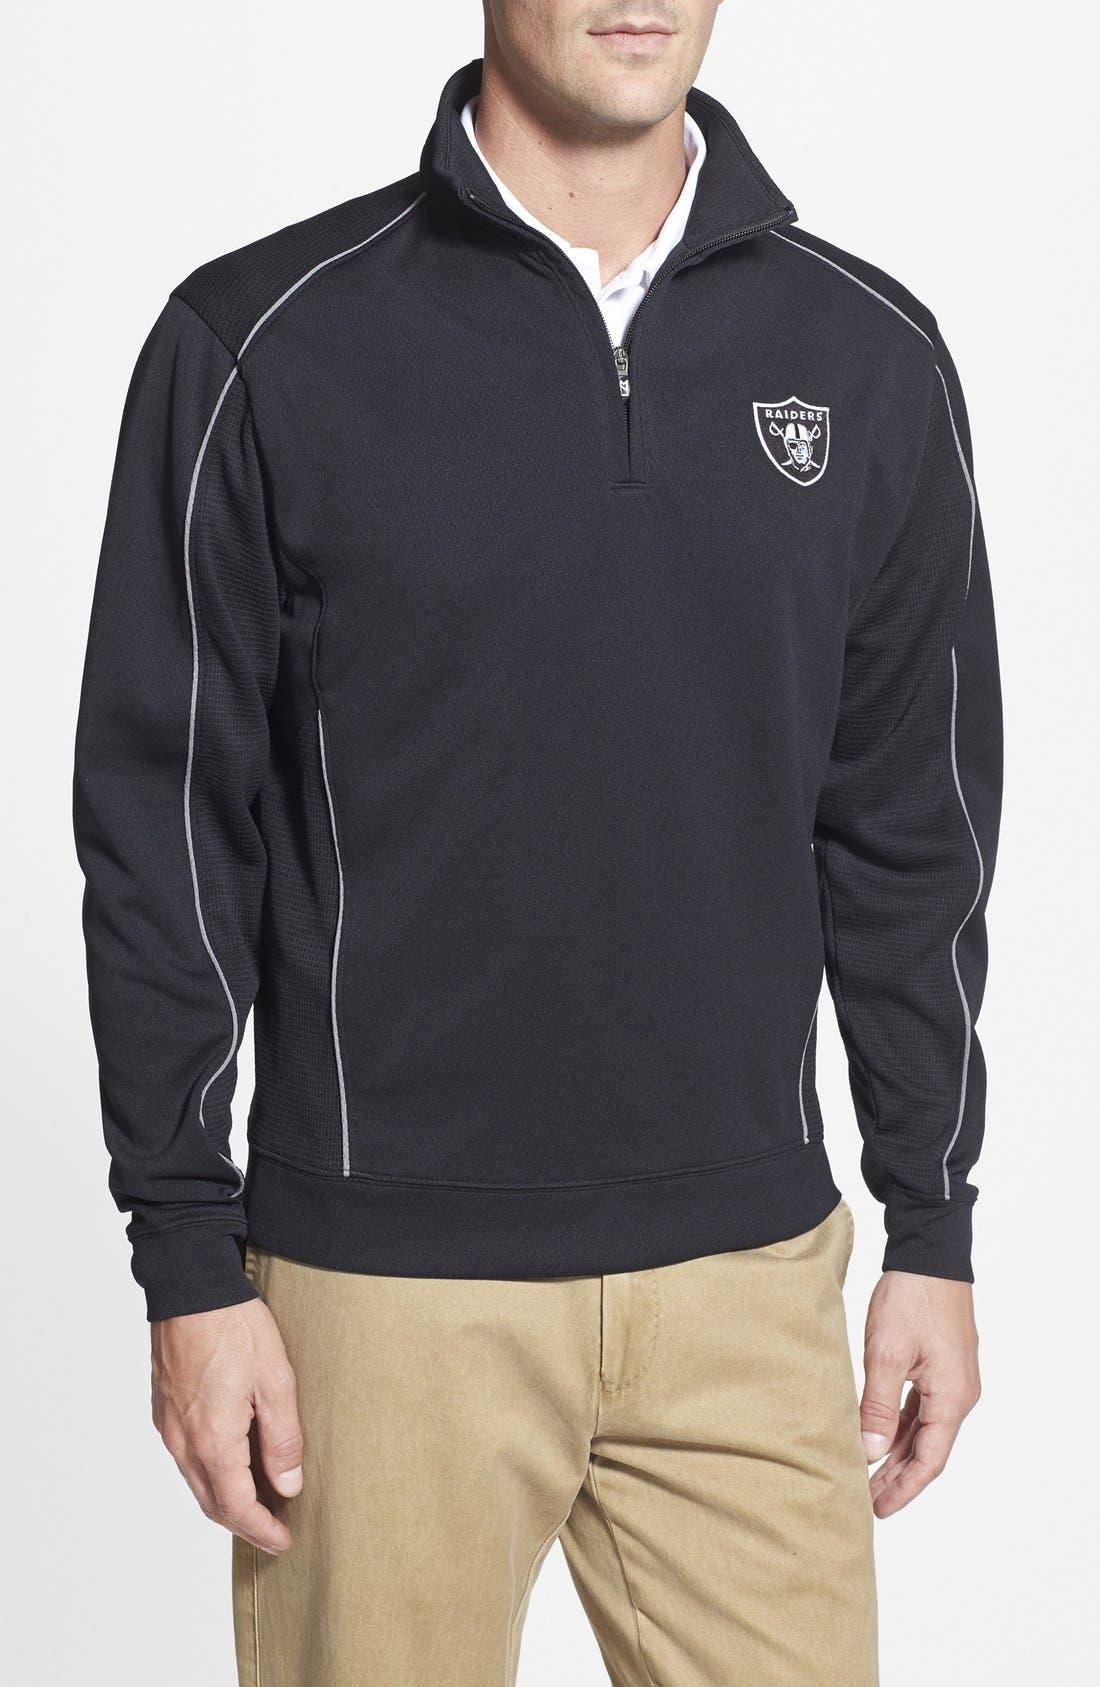 Oakland Raiders - Edge DryTec Moisture Wicking Half Zip Pullover,                             Main thumbnail 1, color,                             001